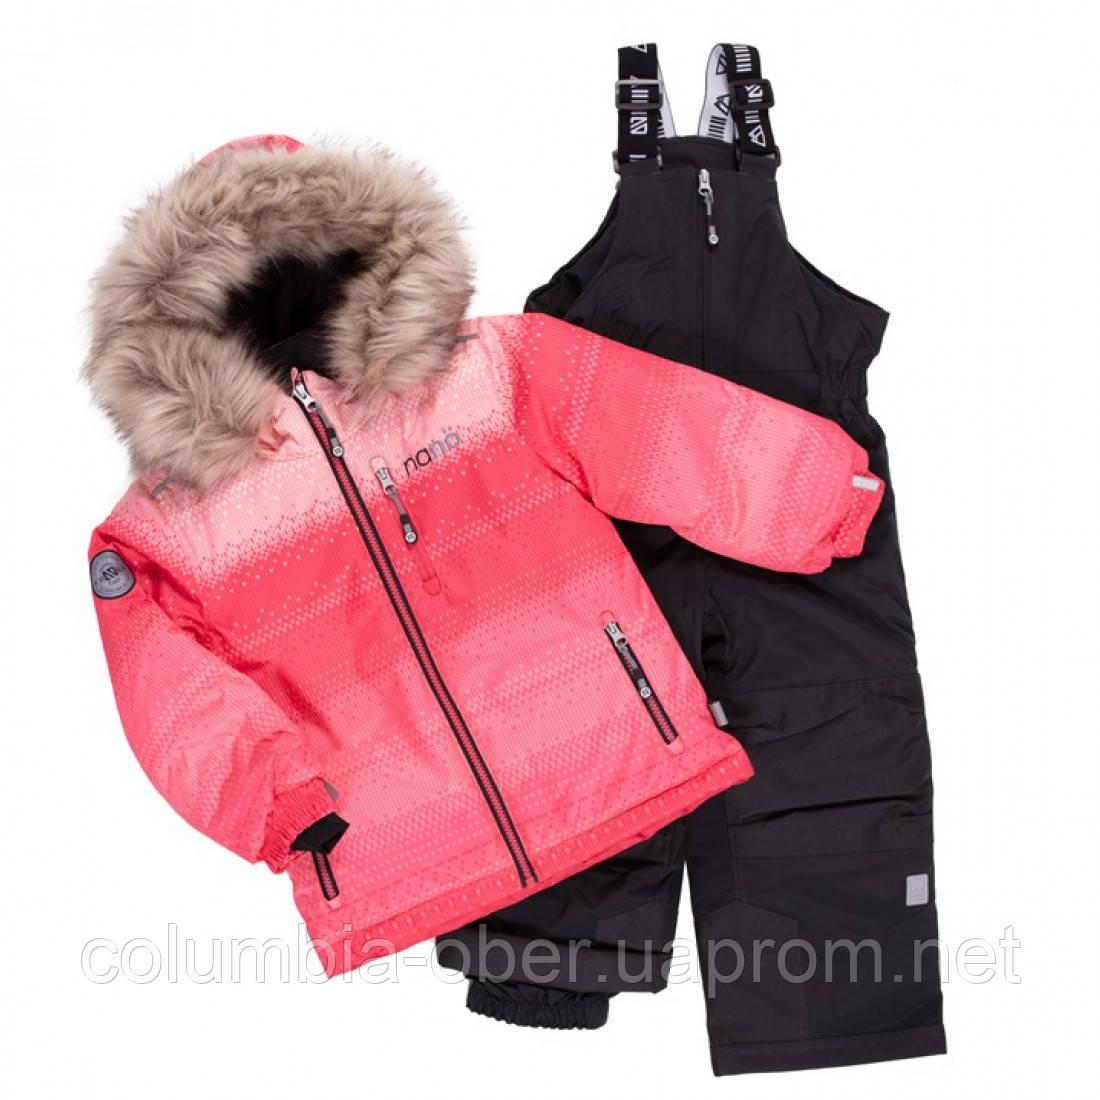 Зимний термокомплект для девочки NANO F20M258 PinkFusion DpGray. Размеры 3 - 10.